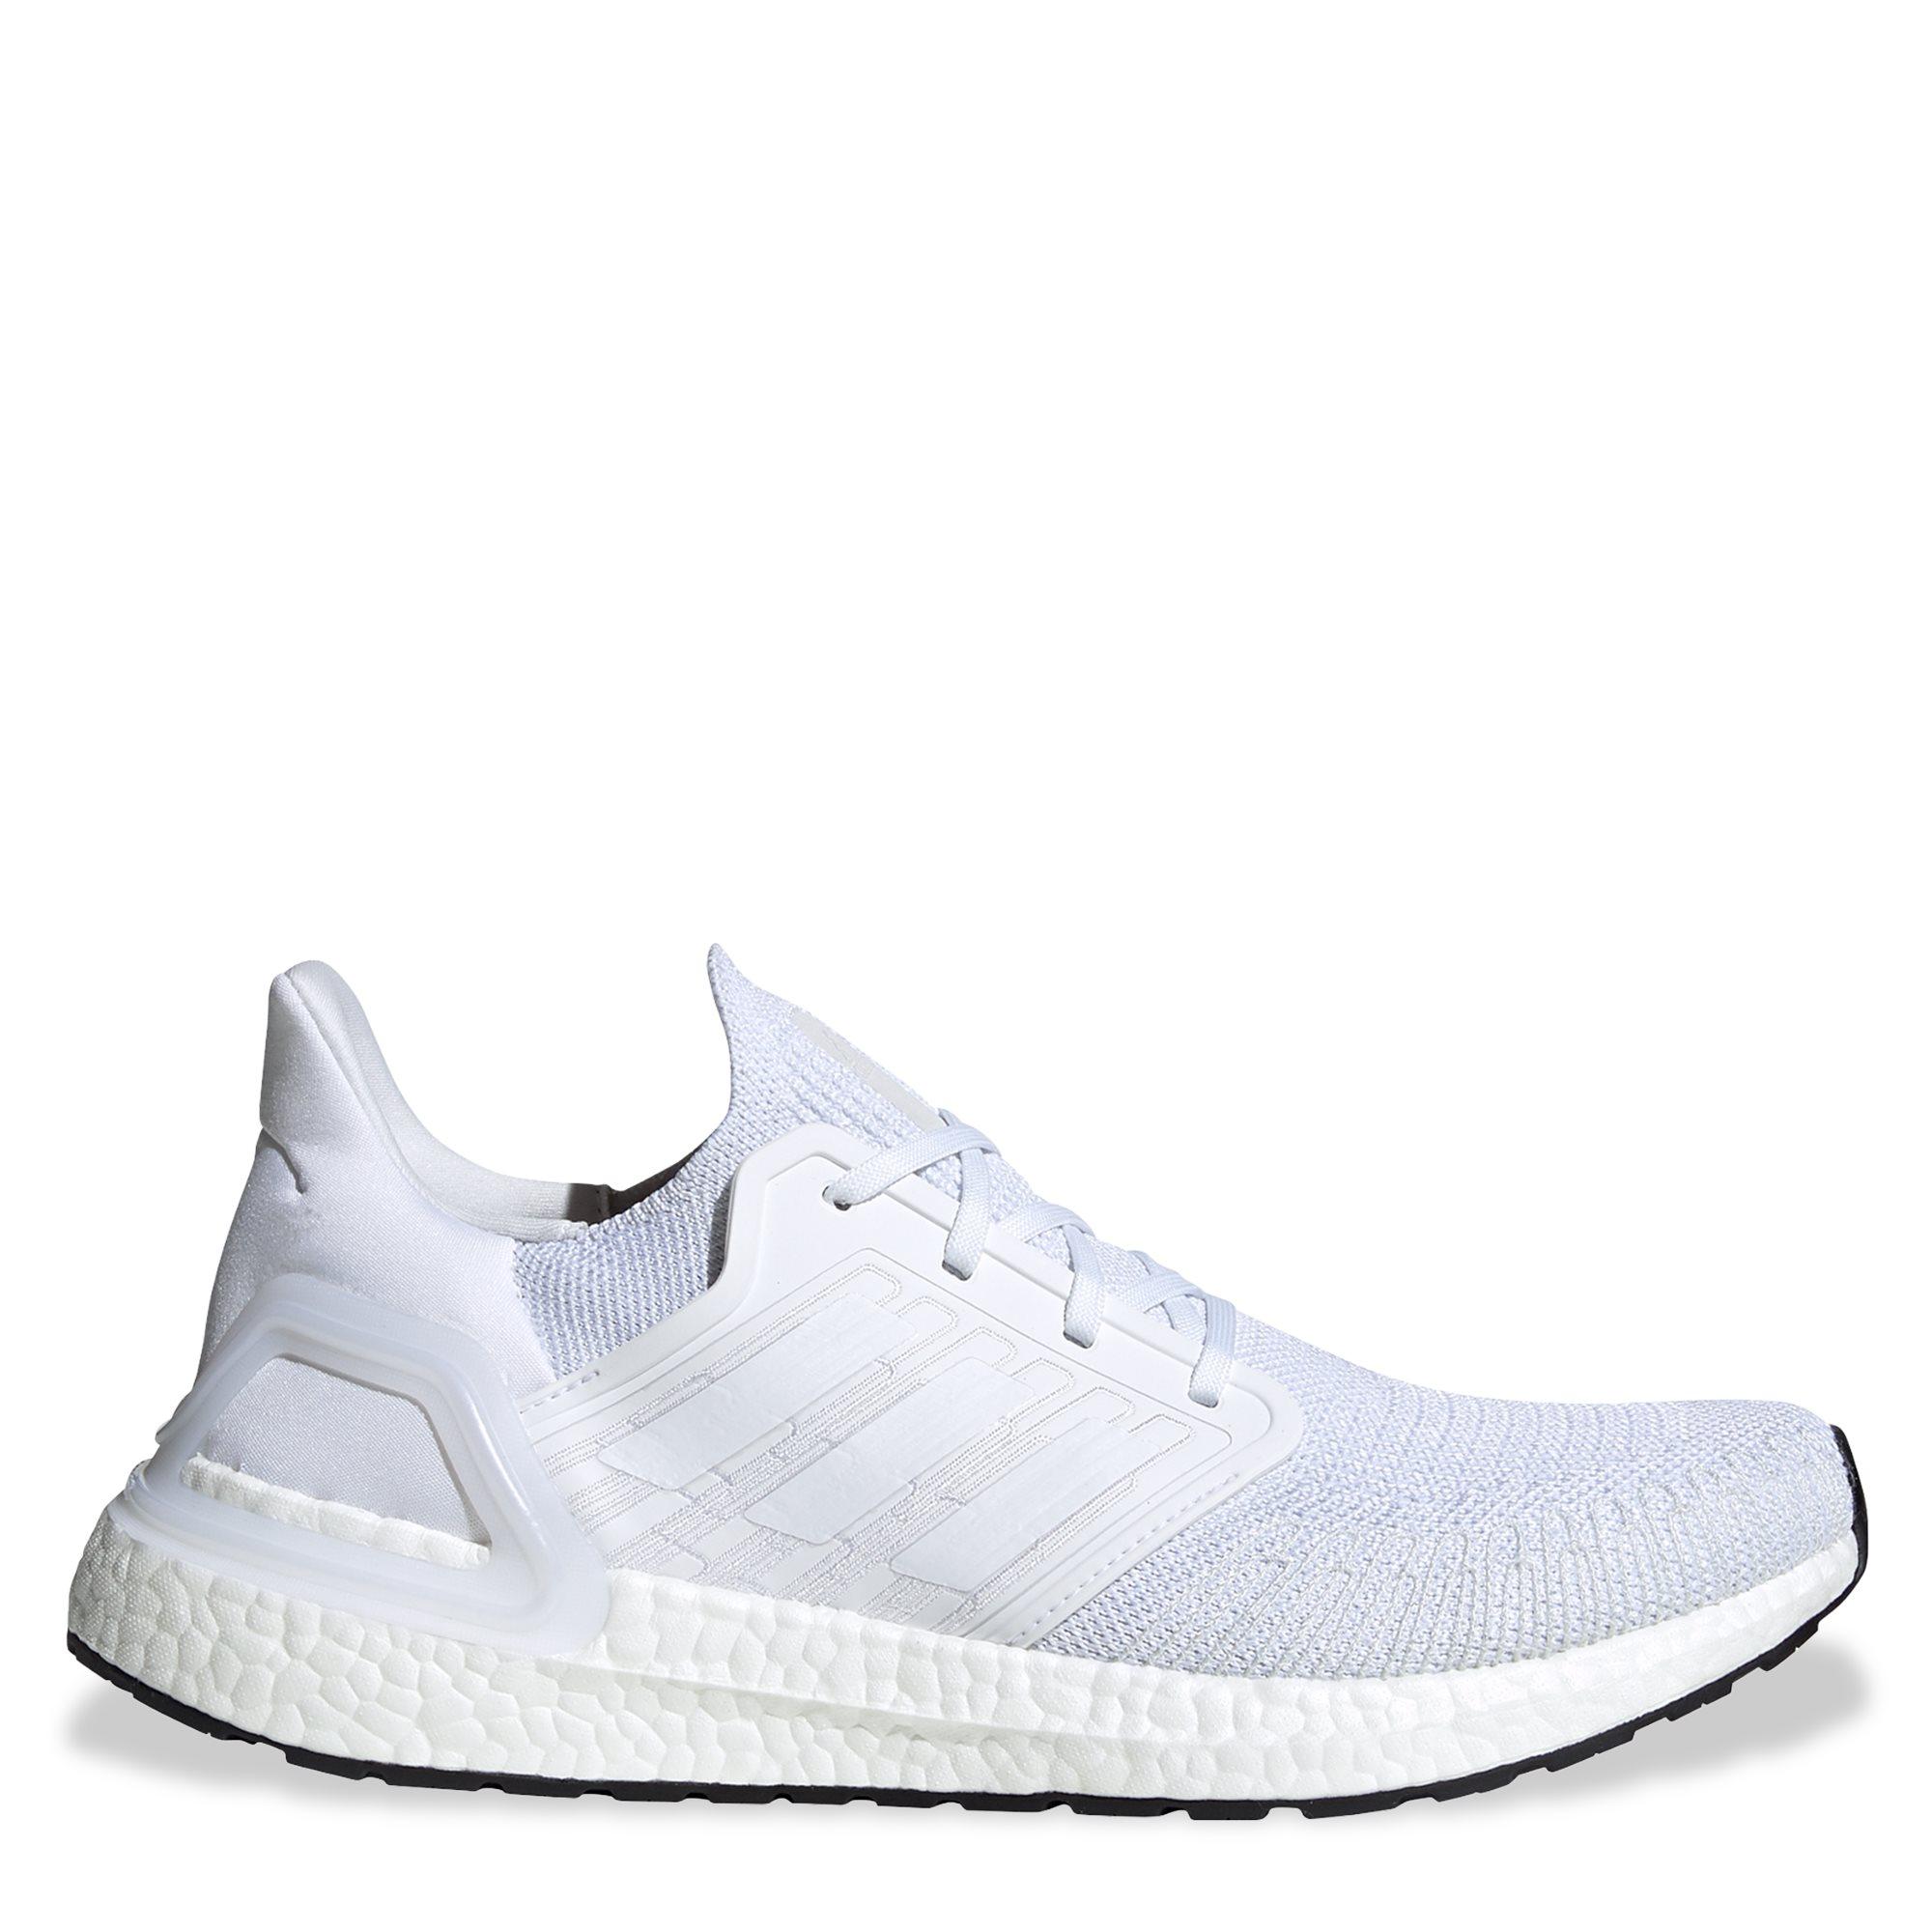 Ultraboost 20 Sneaker - Sko - Hvid